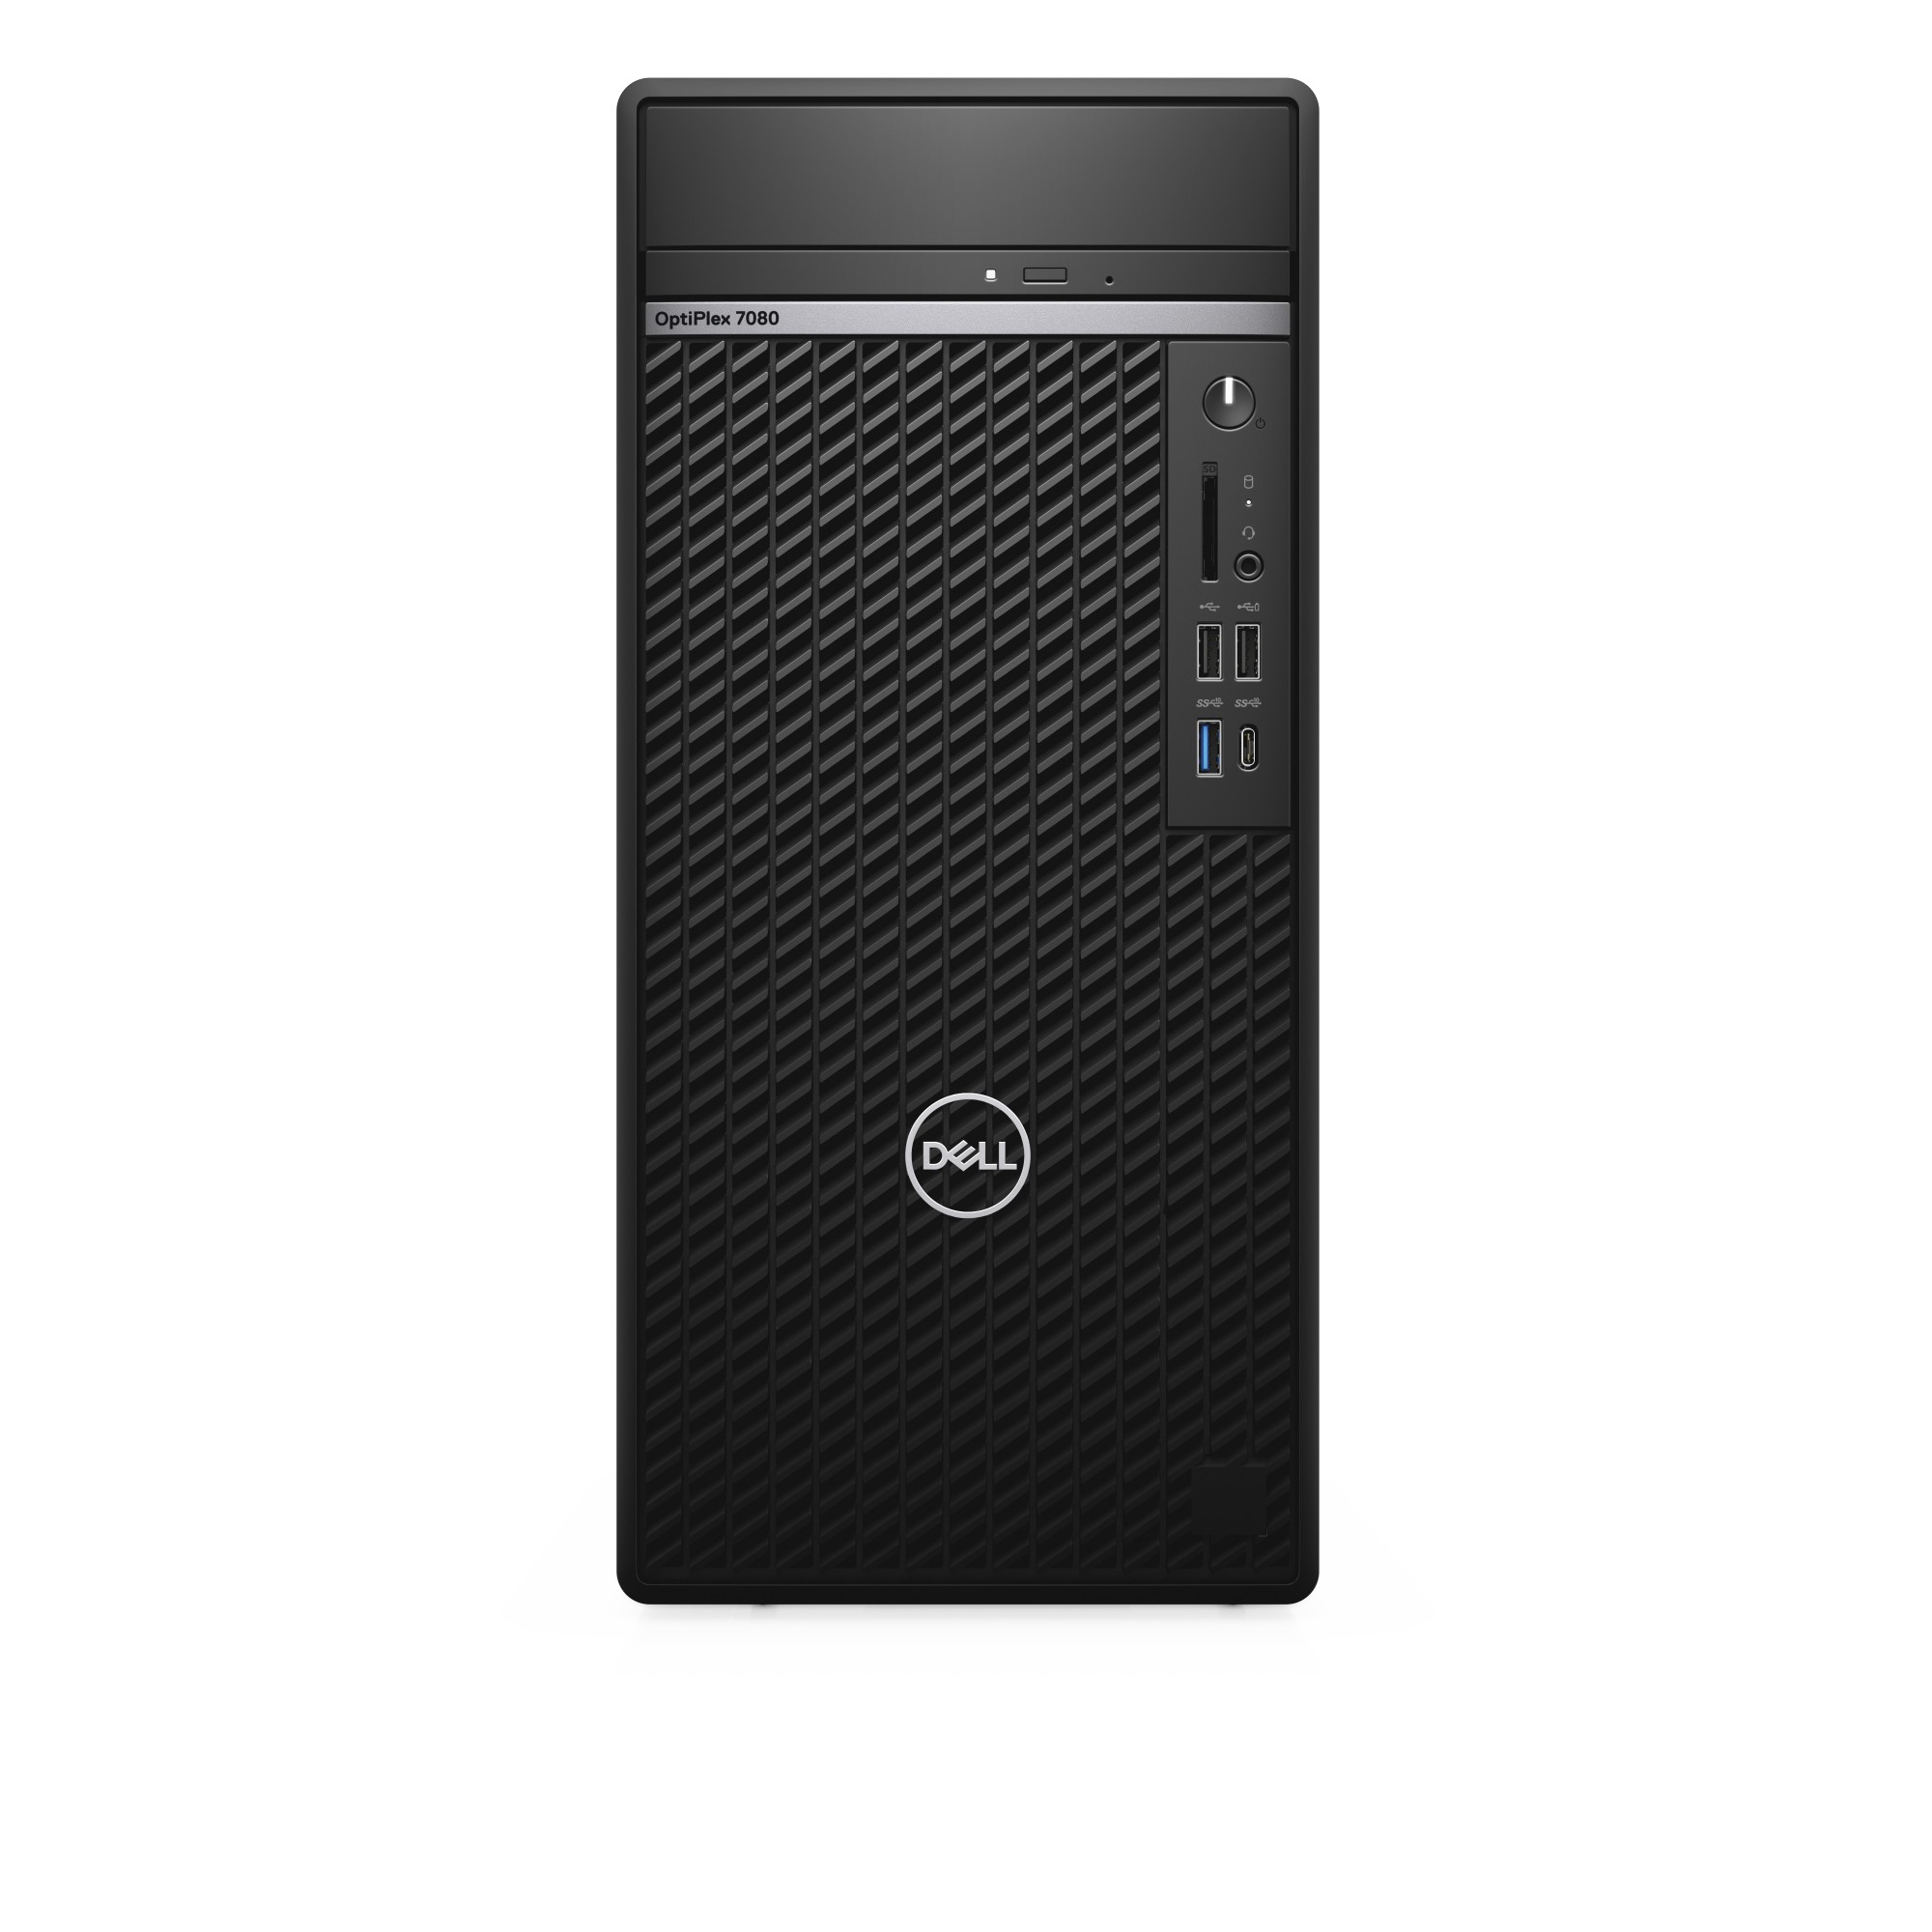 DELL OptiPlex 7080 Intel® Core™ i7 de 10ma Generación i7-10700 16 GB DDR4-SDRAM 512 GB SSD Mini Tower Negro PC Windows 10 Pro